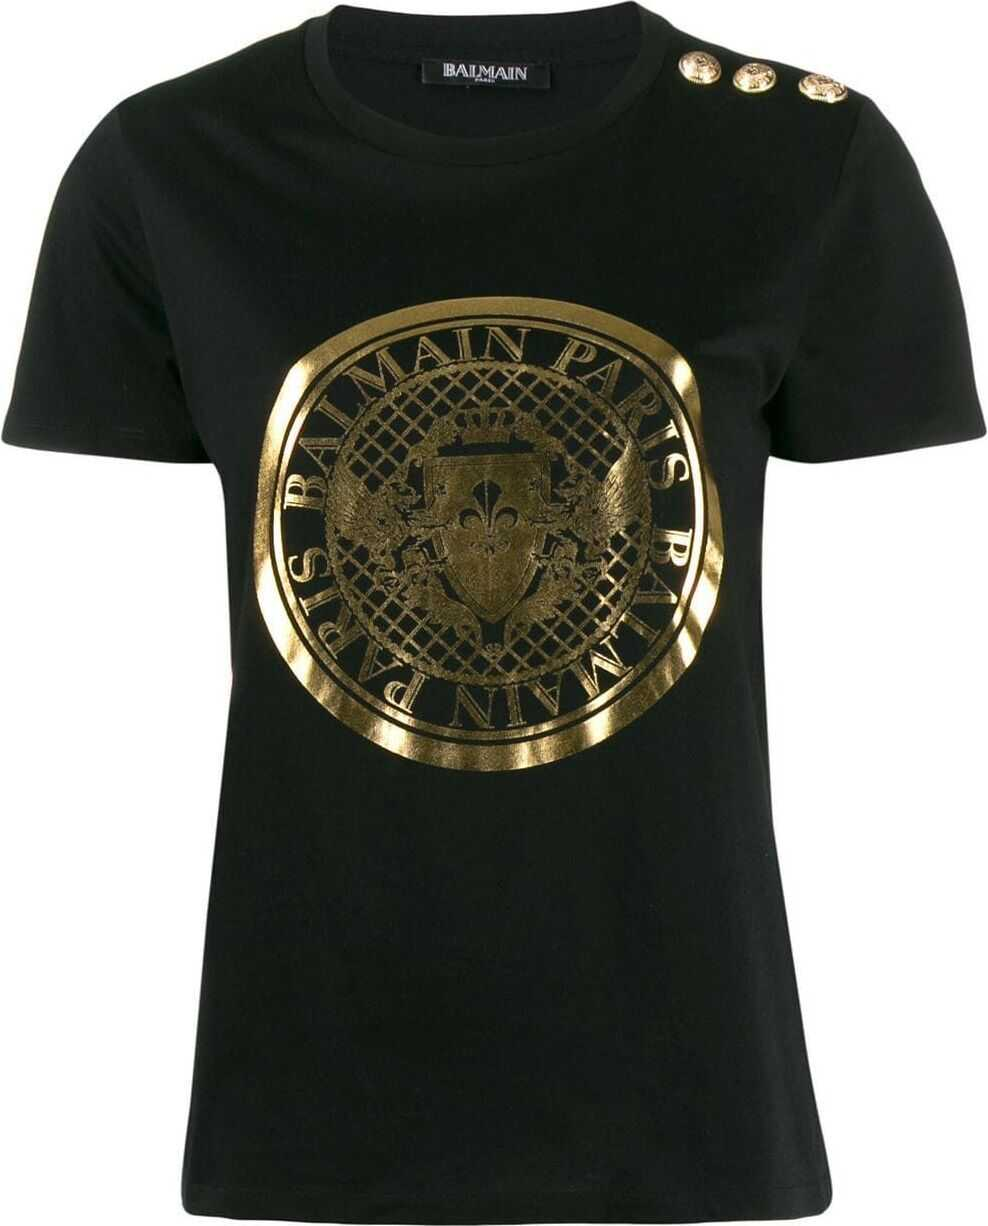 Balmain Cotton T-Shirt BLACK